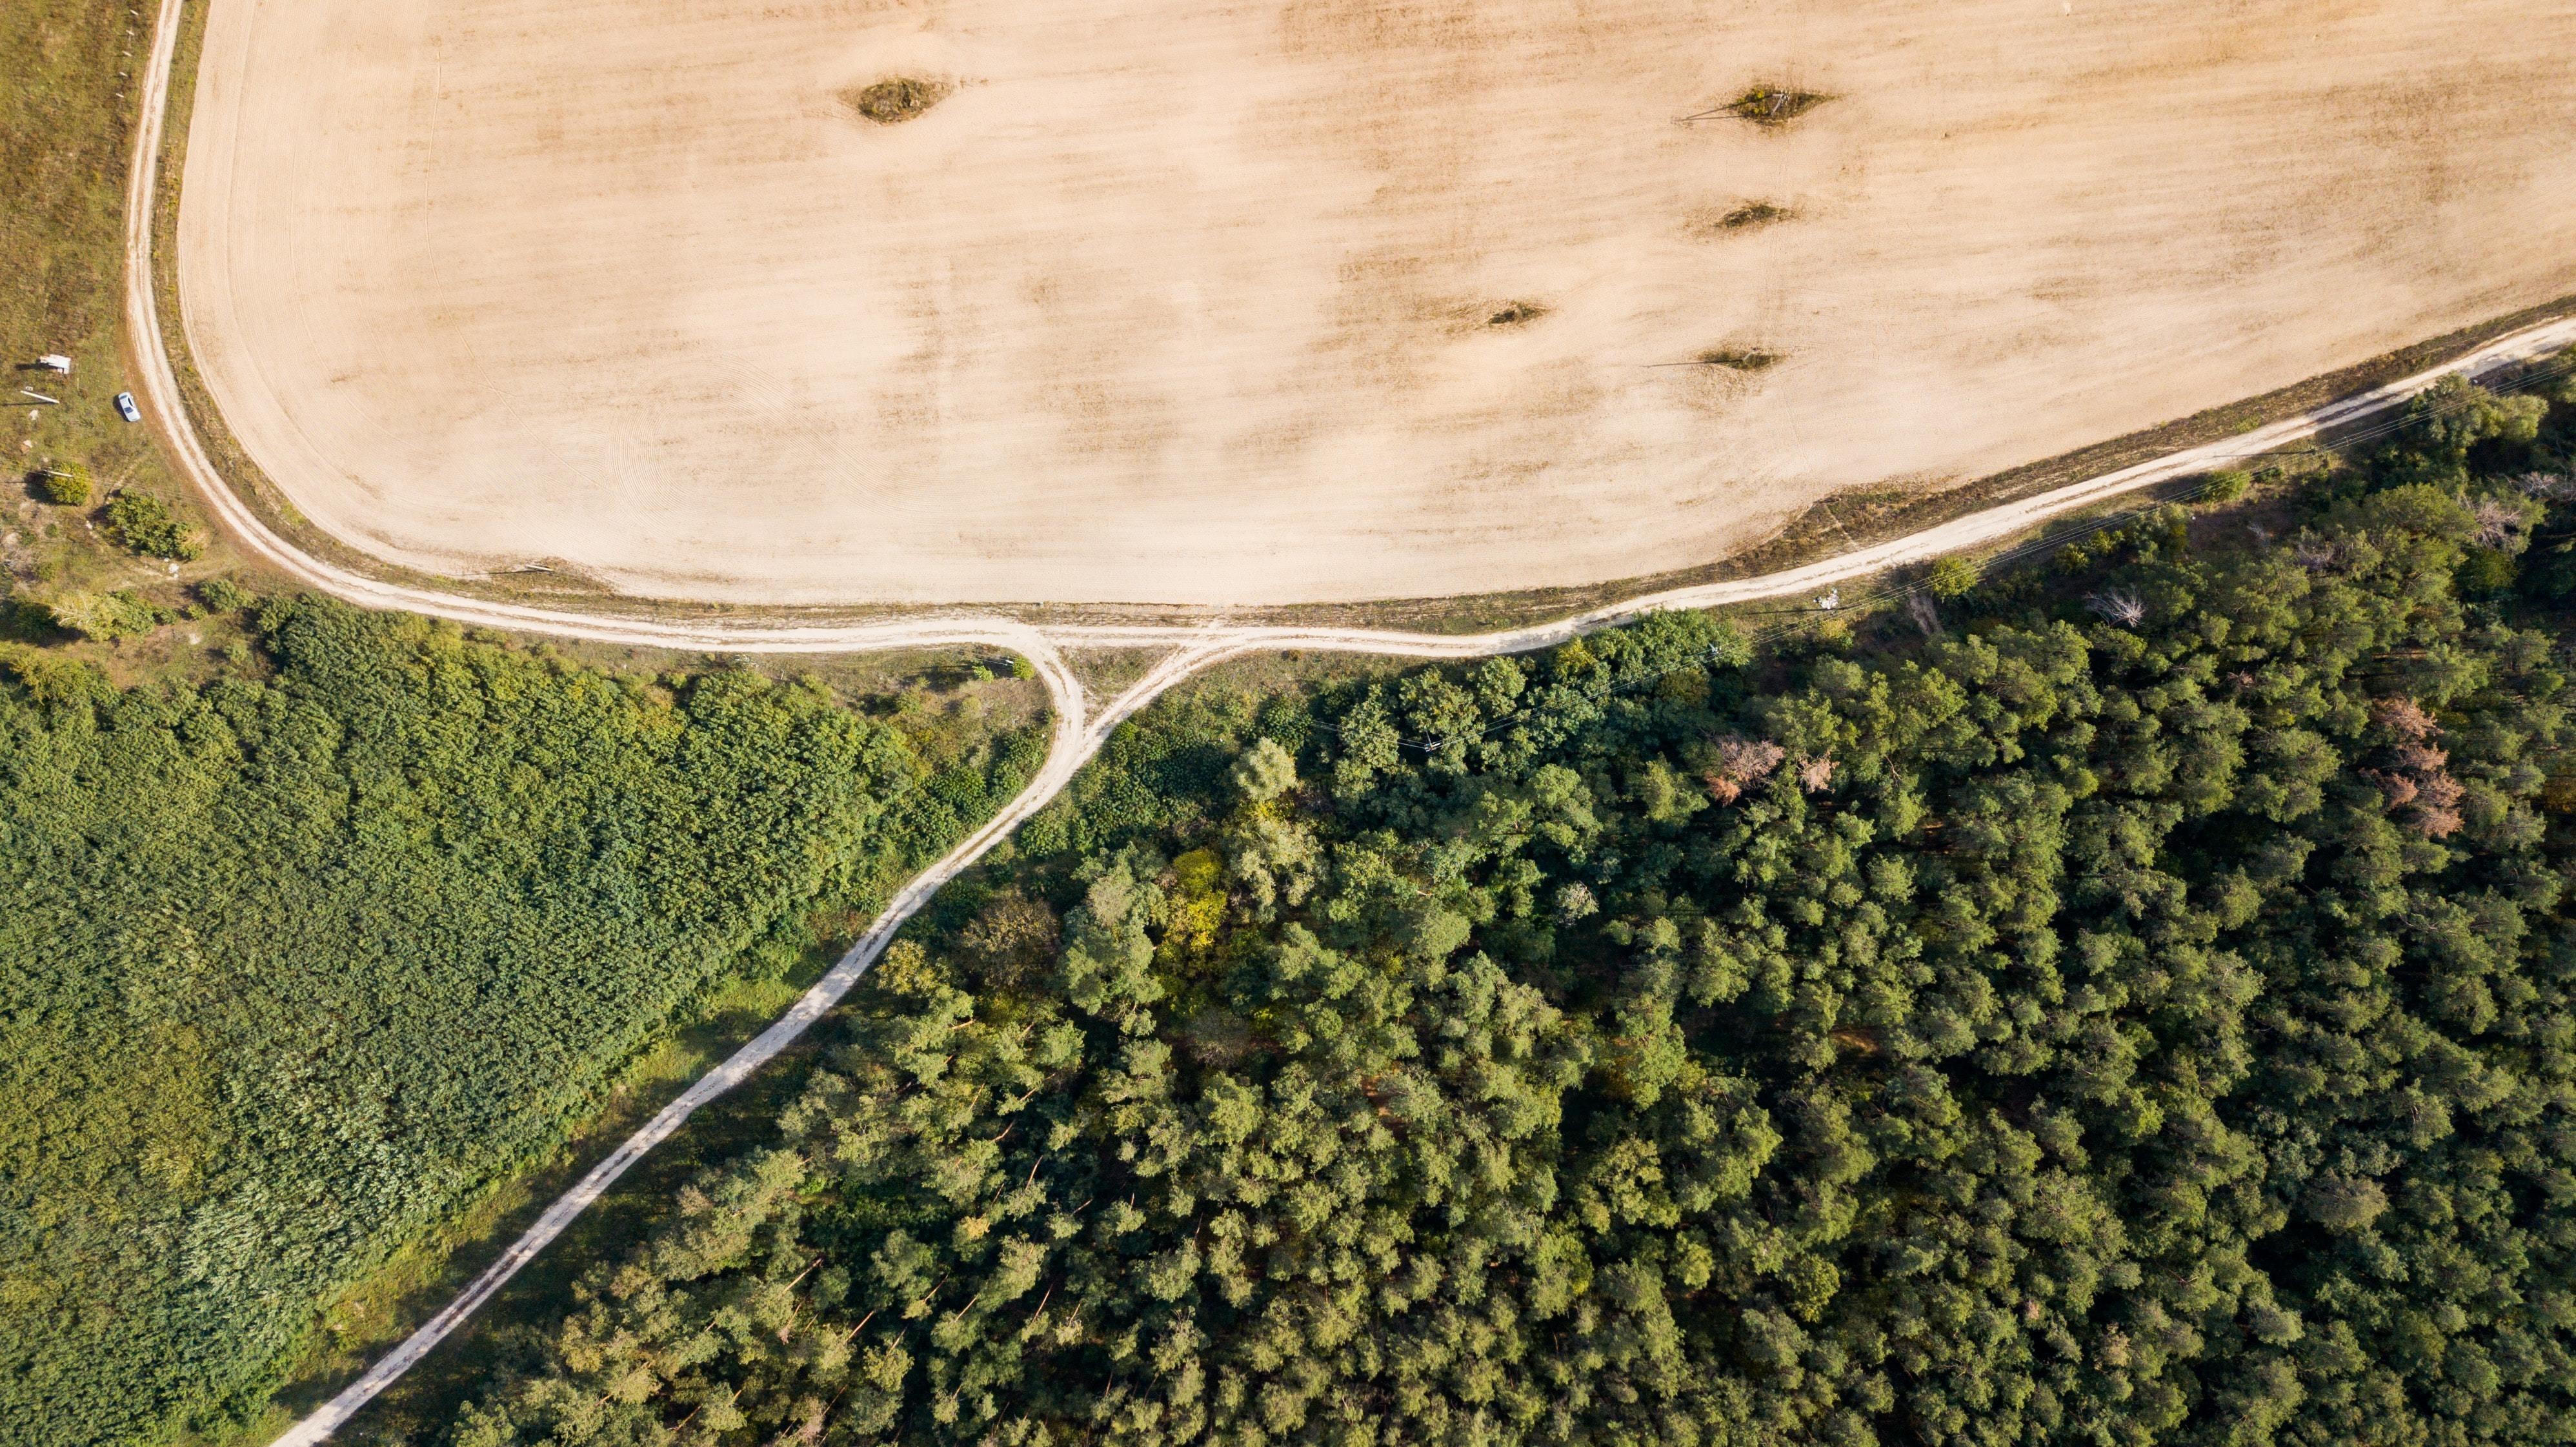 Aerial shot of forest and deforestation.